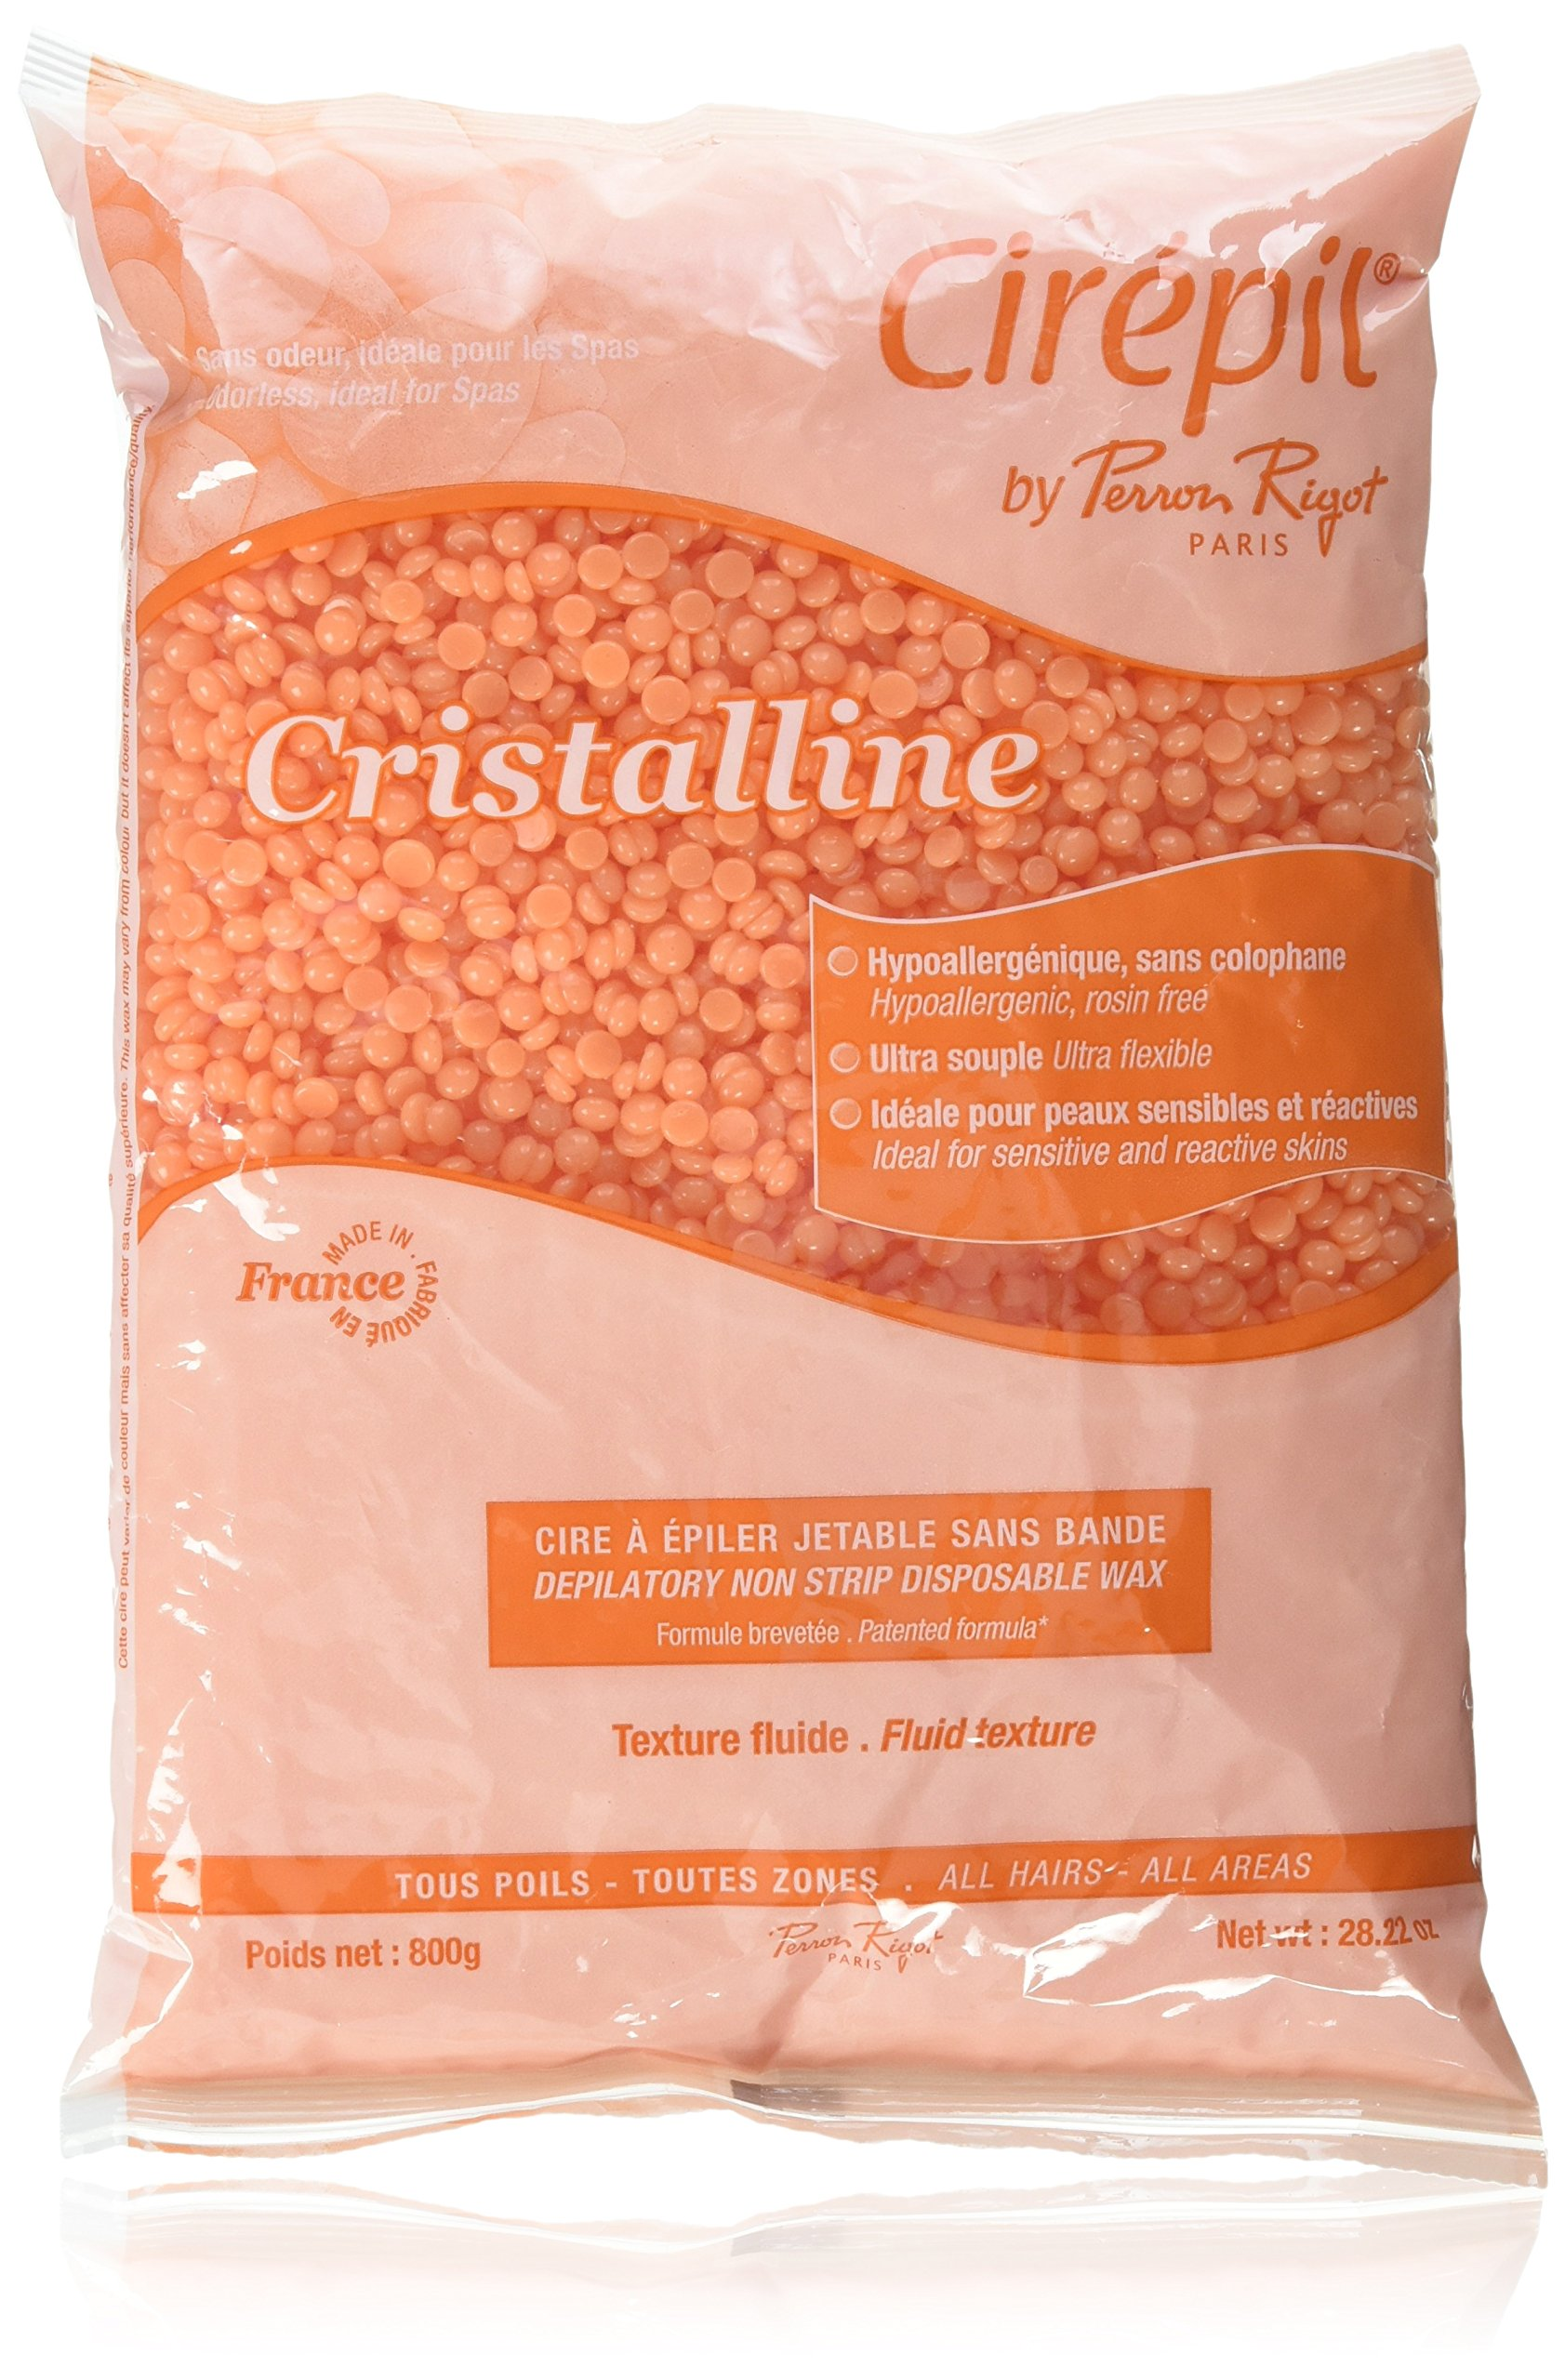 Cirepil Cristalline Wax Refill Bag, 800 Gram